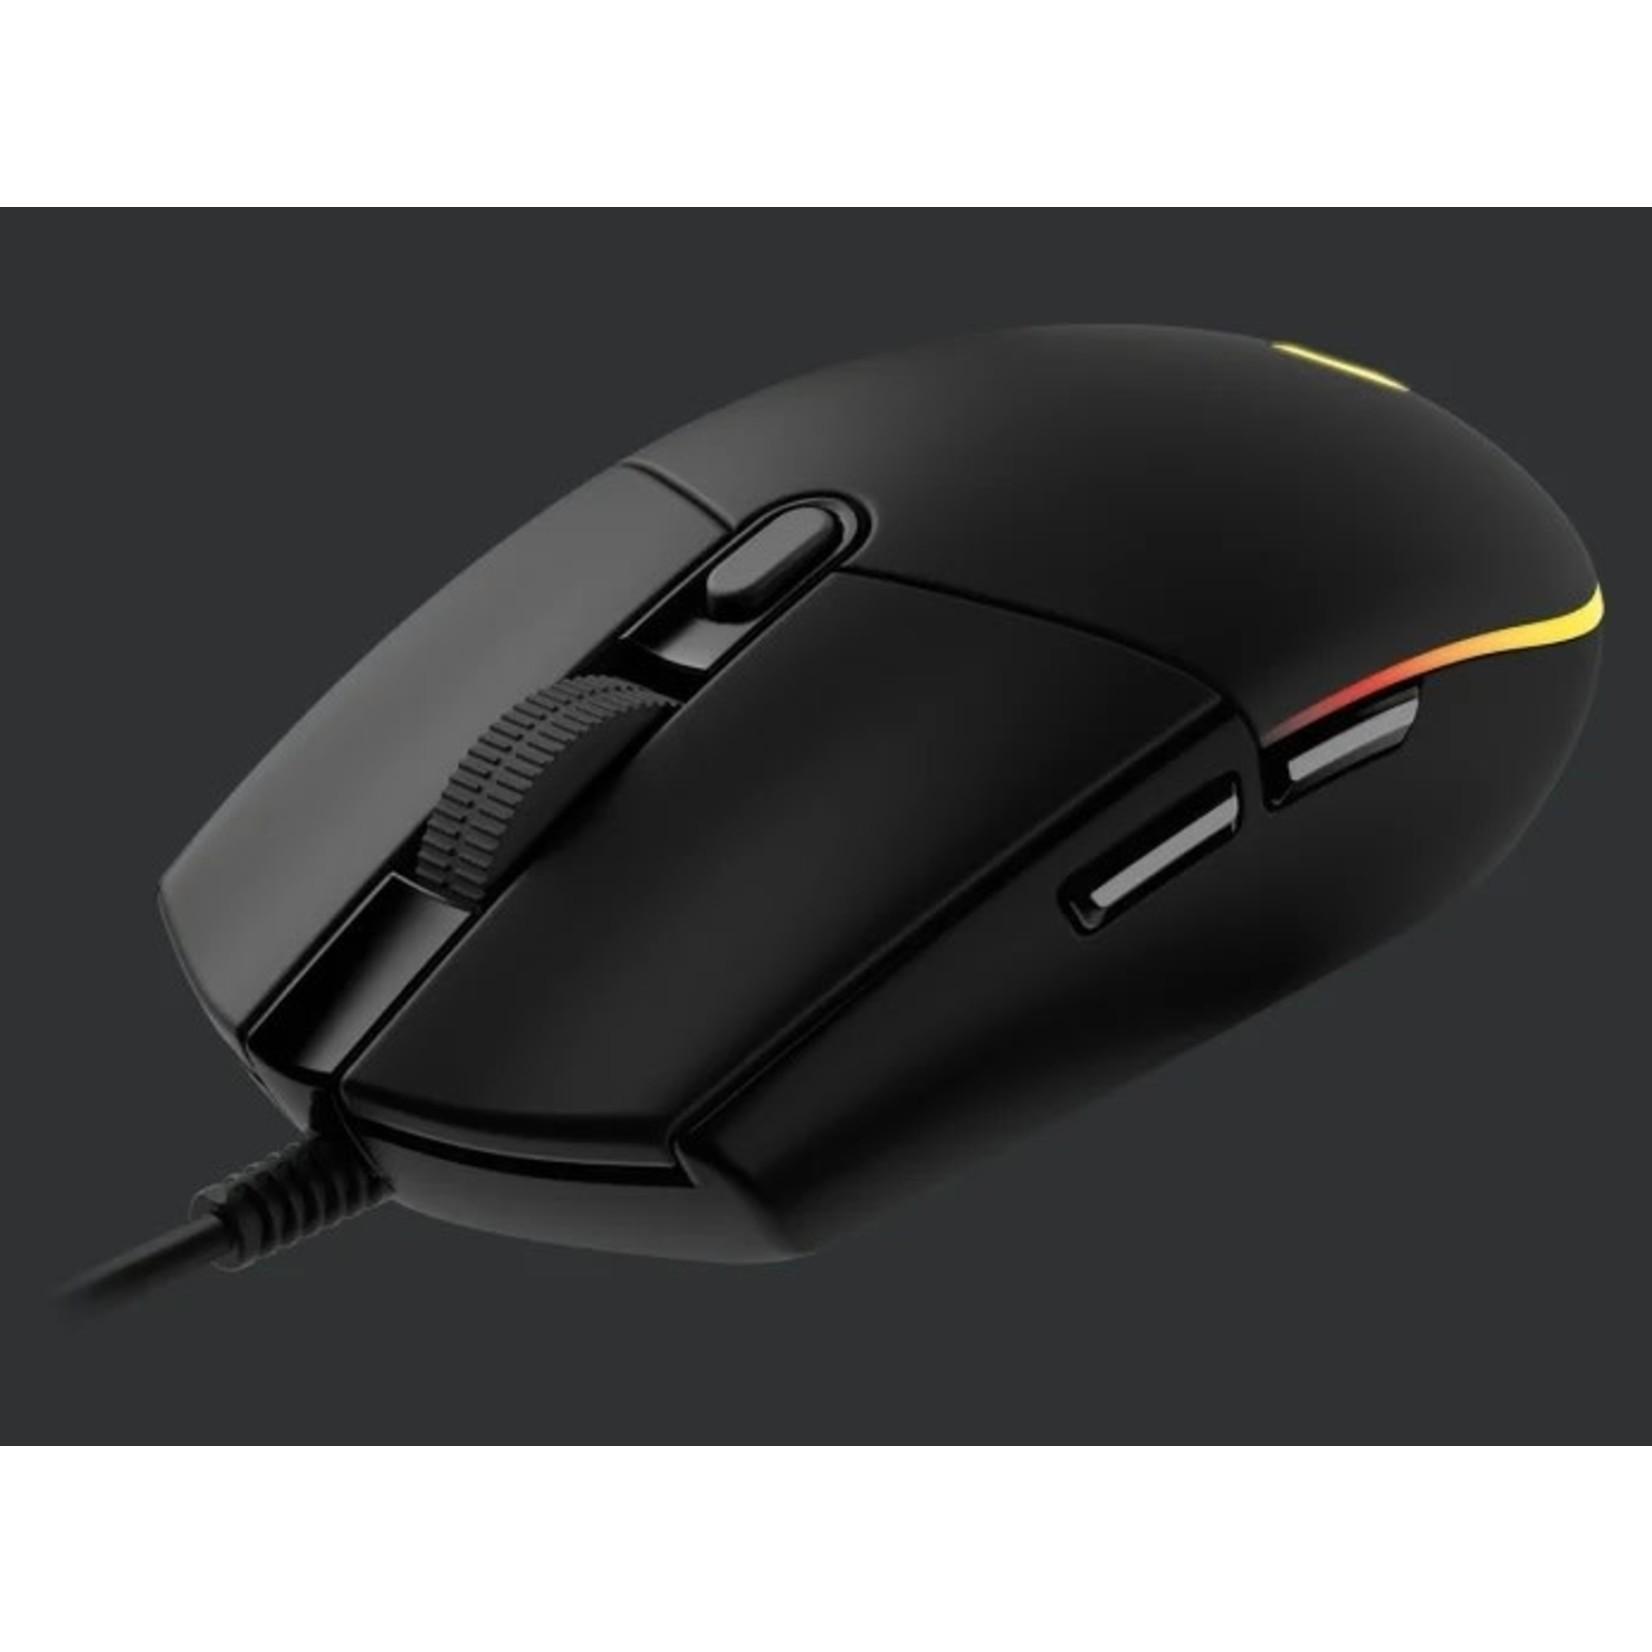 Logitech Logitech G203 Lightsync Gaming Mouse Black